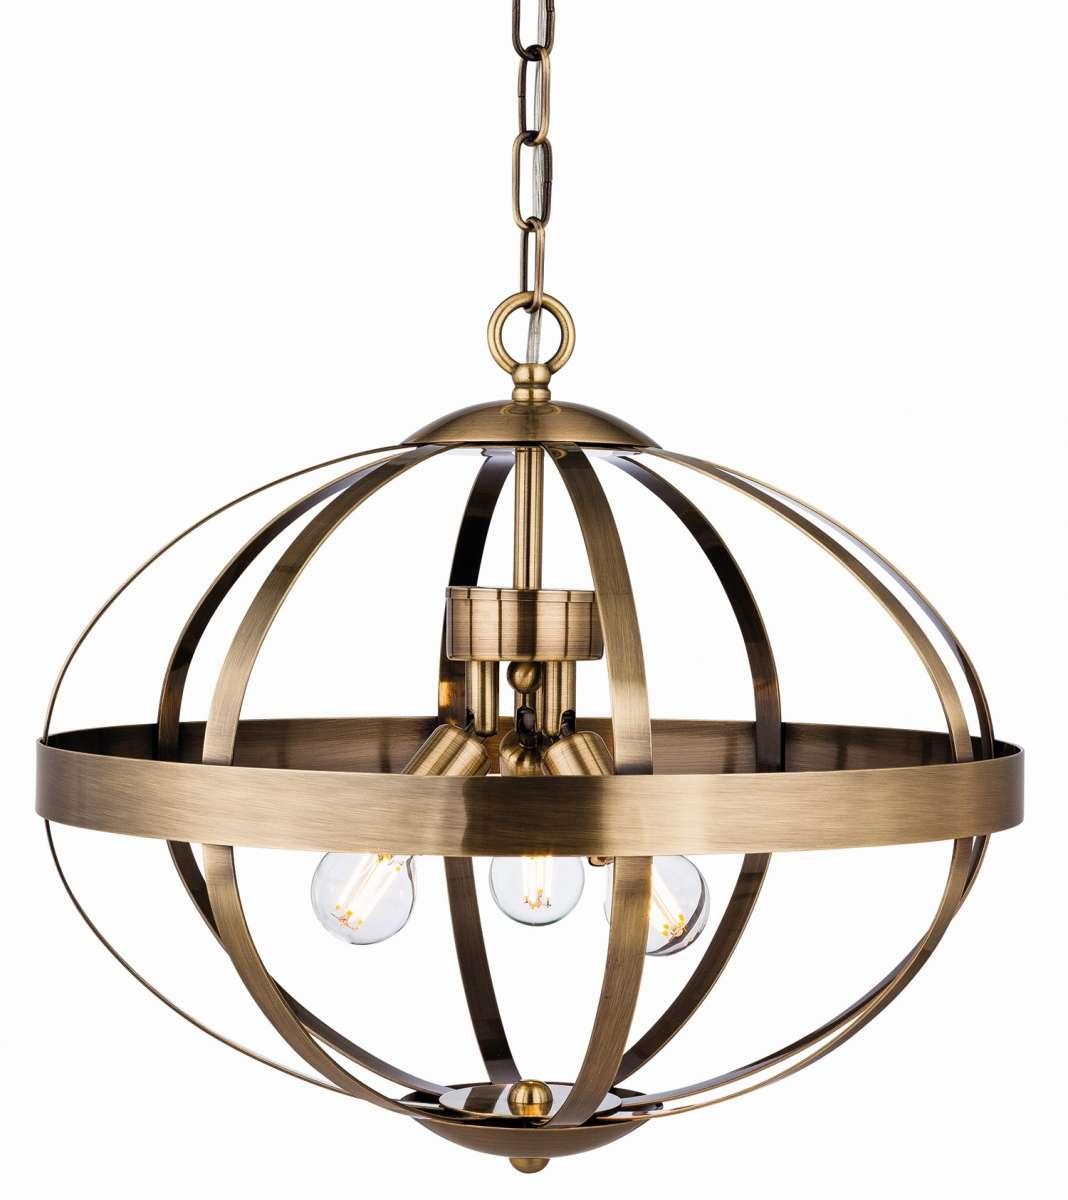 Healey 3 Light Pendant in Antique Brass Finish